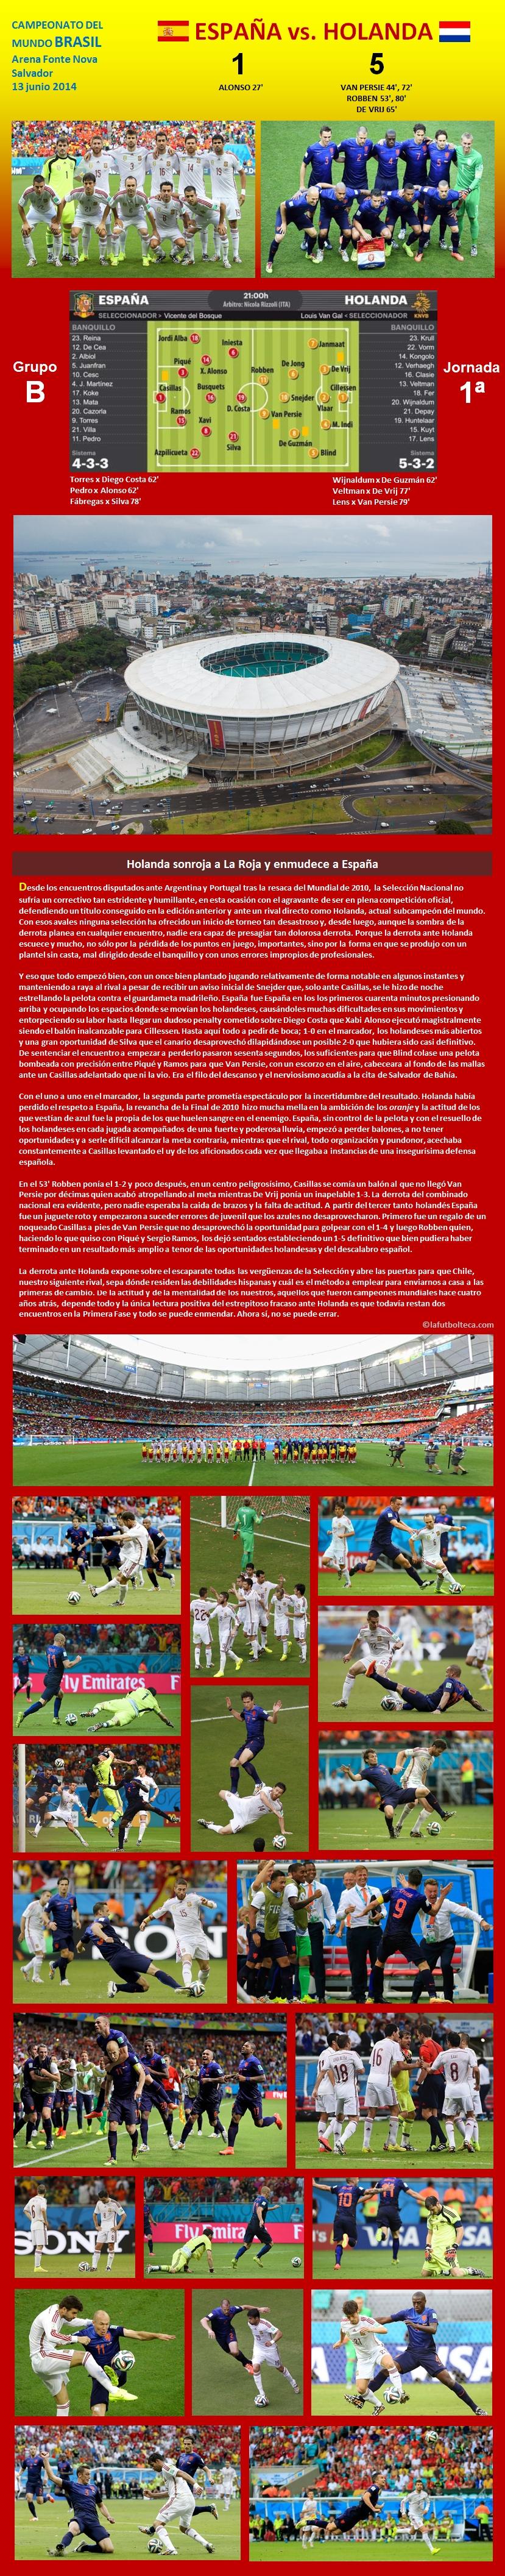 Espana vs Holanda